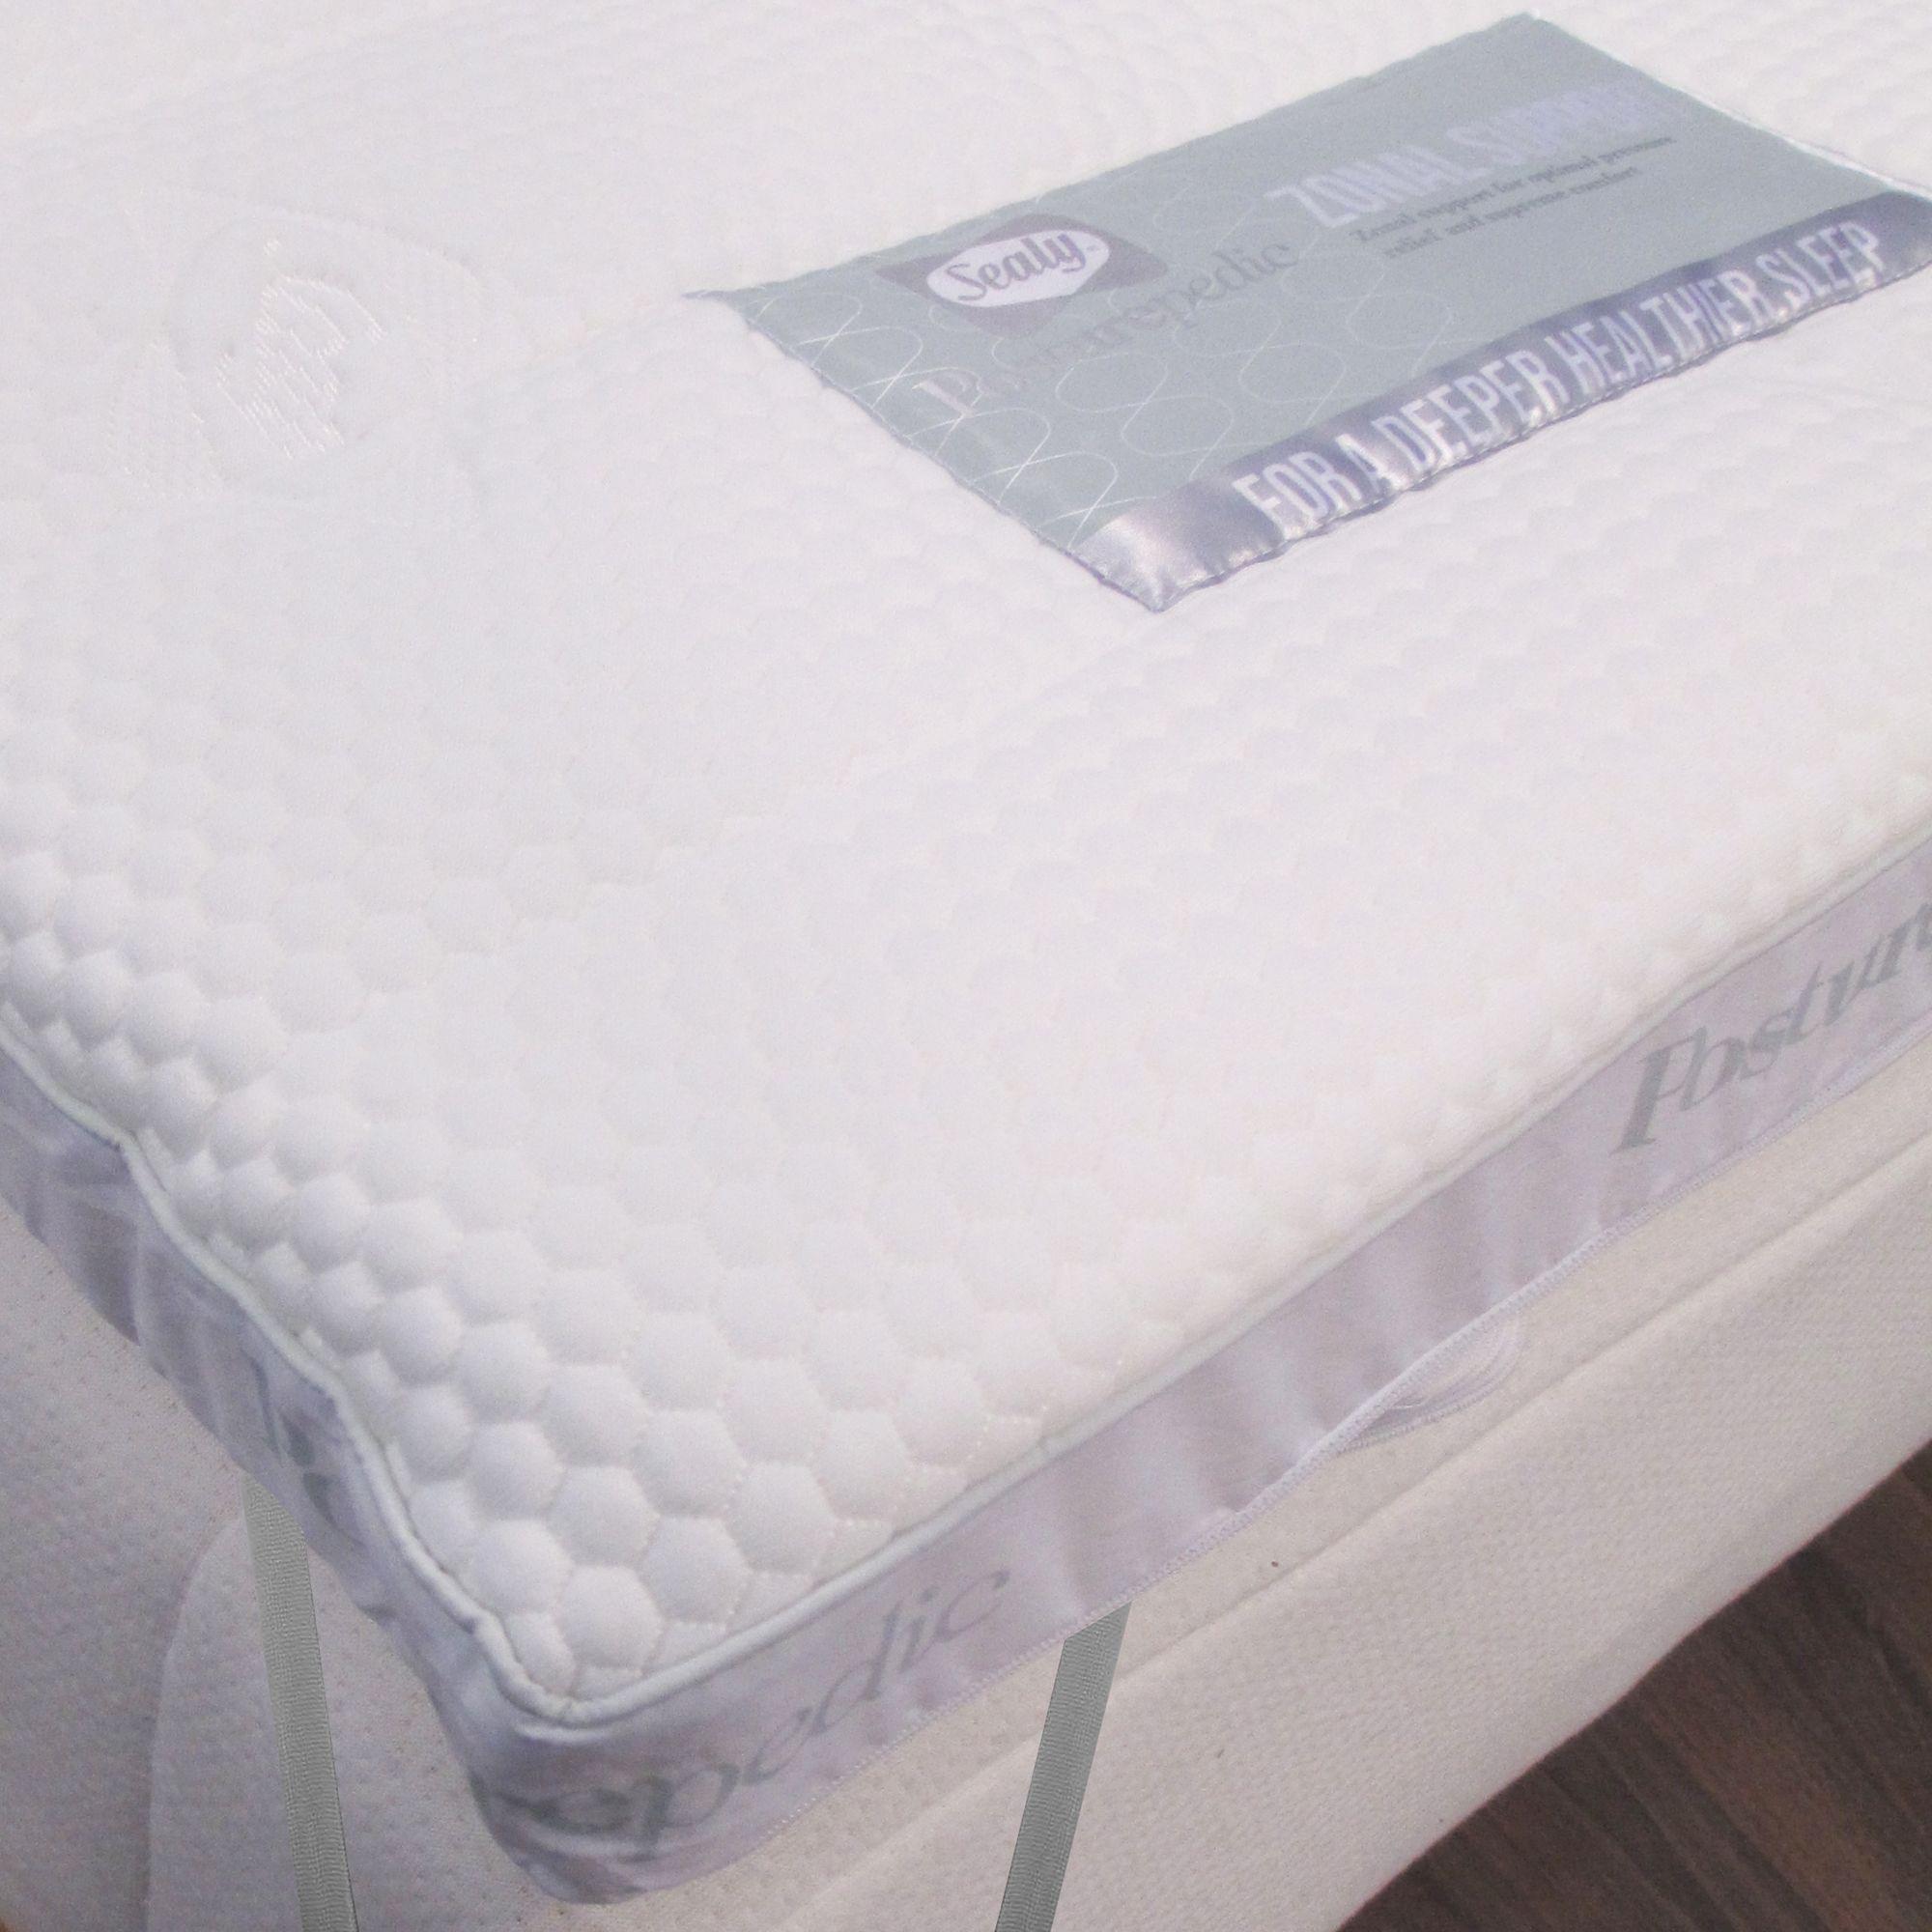 Sealy Zonal Support Memory Foam Mattress Enhancer From Debenhams Ebay